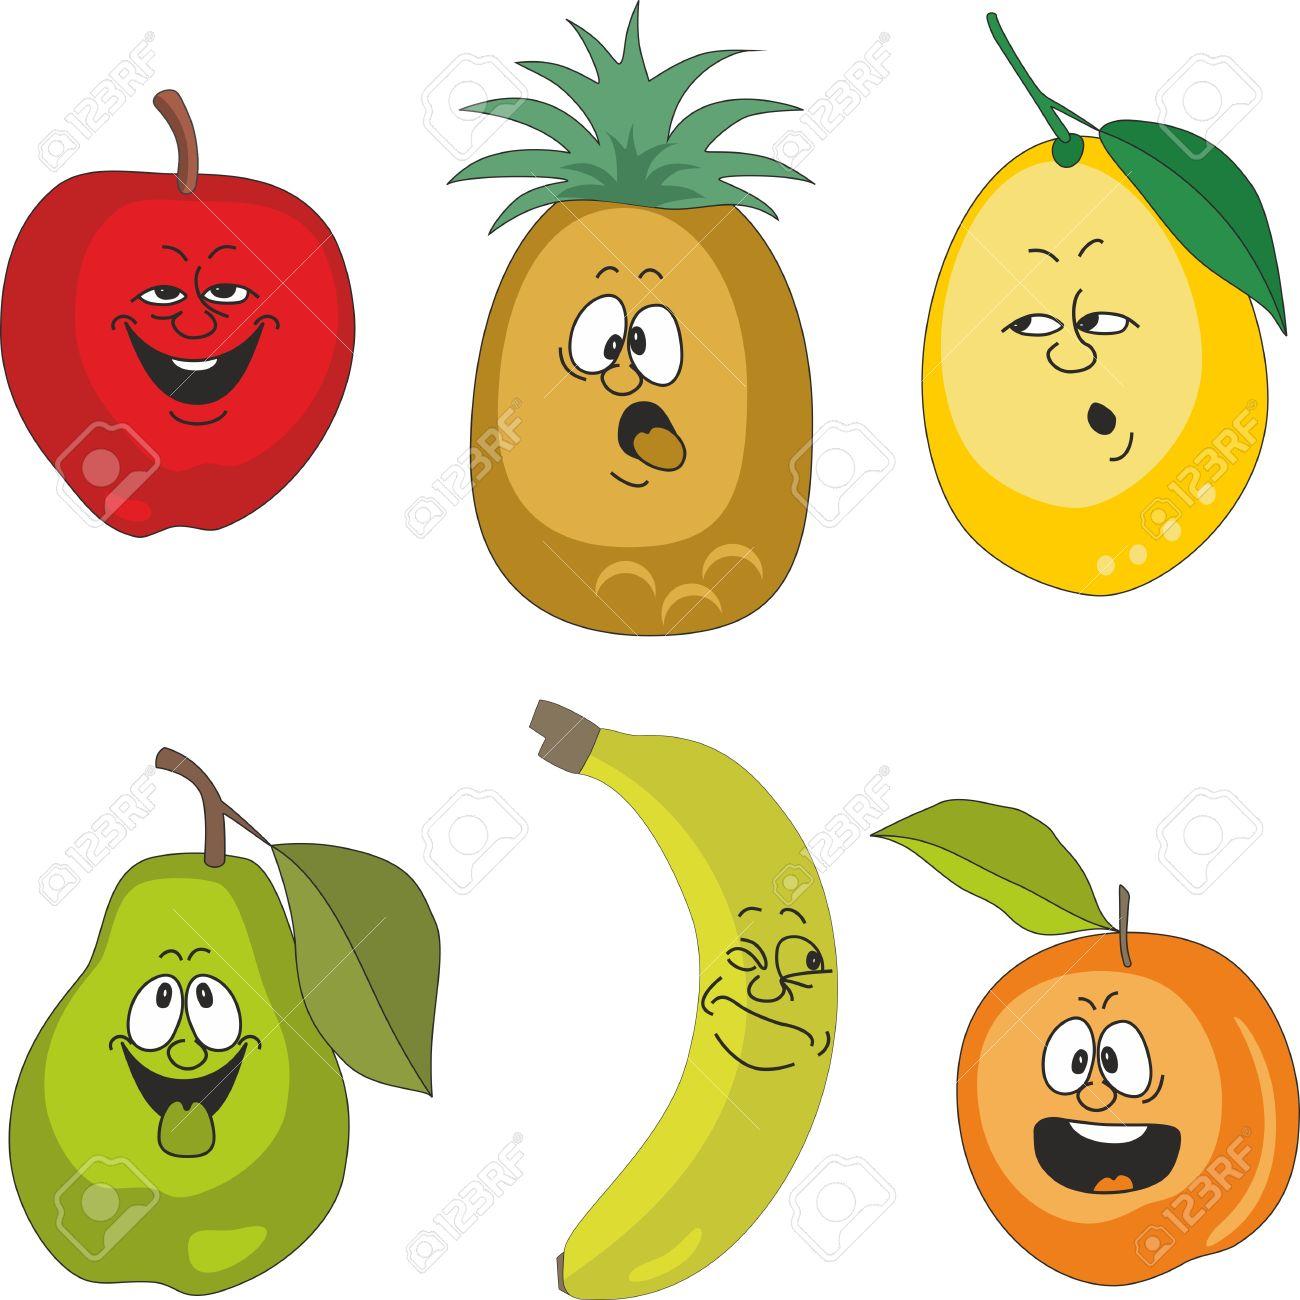 vectorial emoción dibujos animados frutas establecen 010